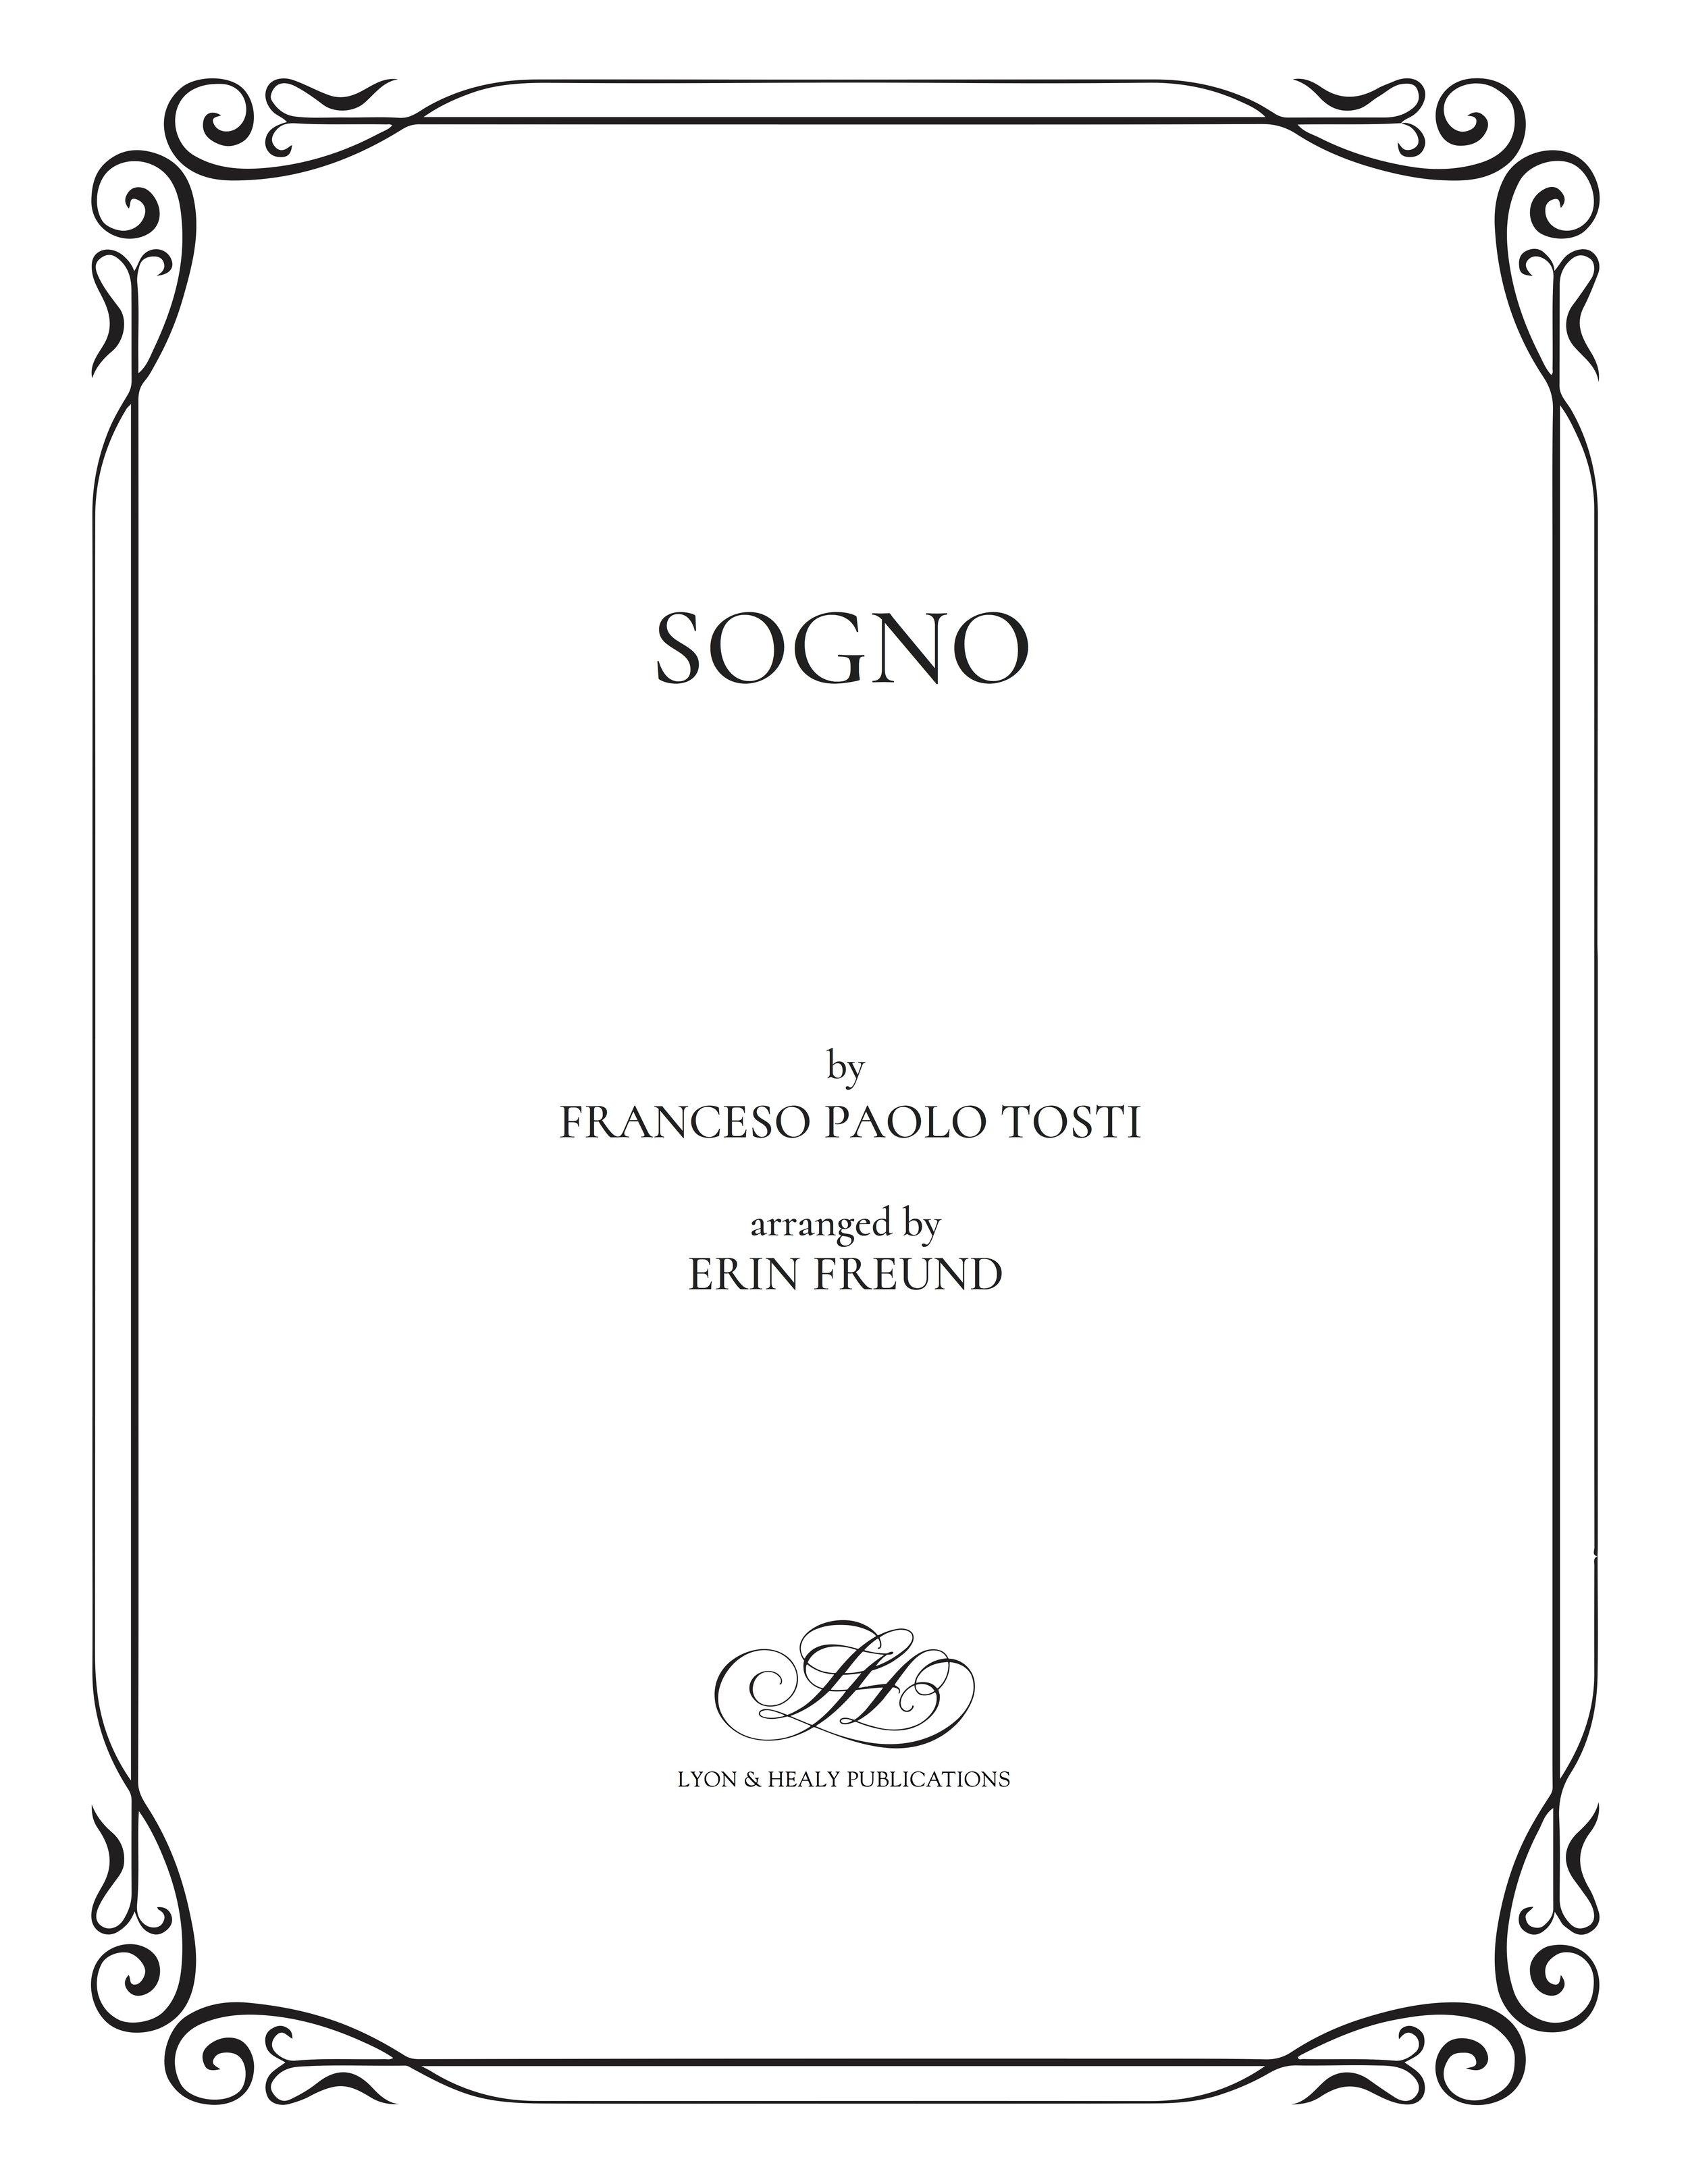 Sogno - Tosti-Freund cover.jpg